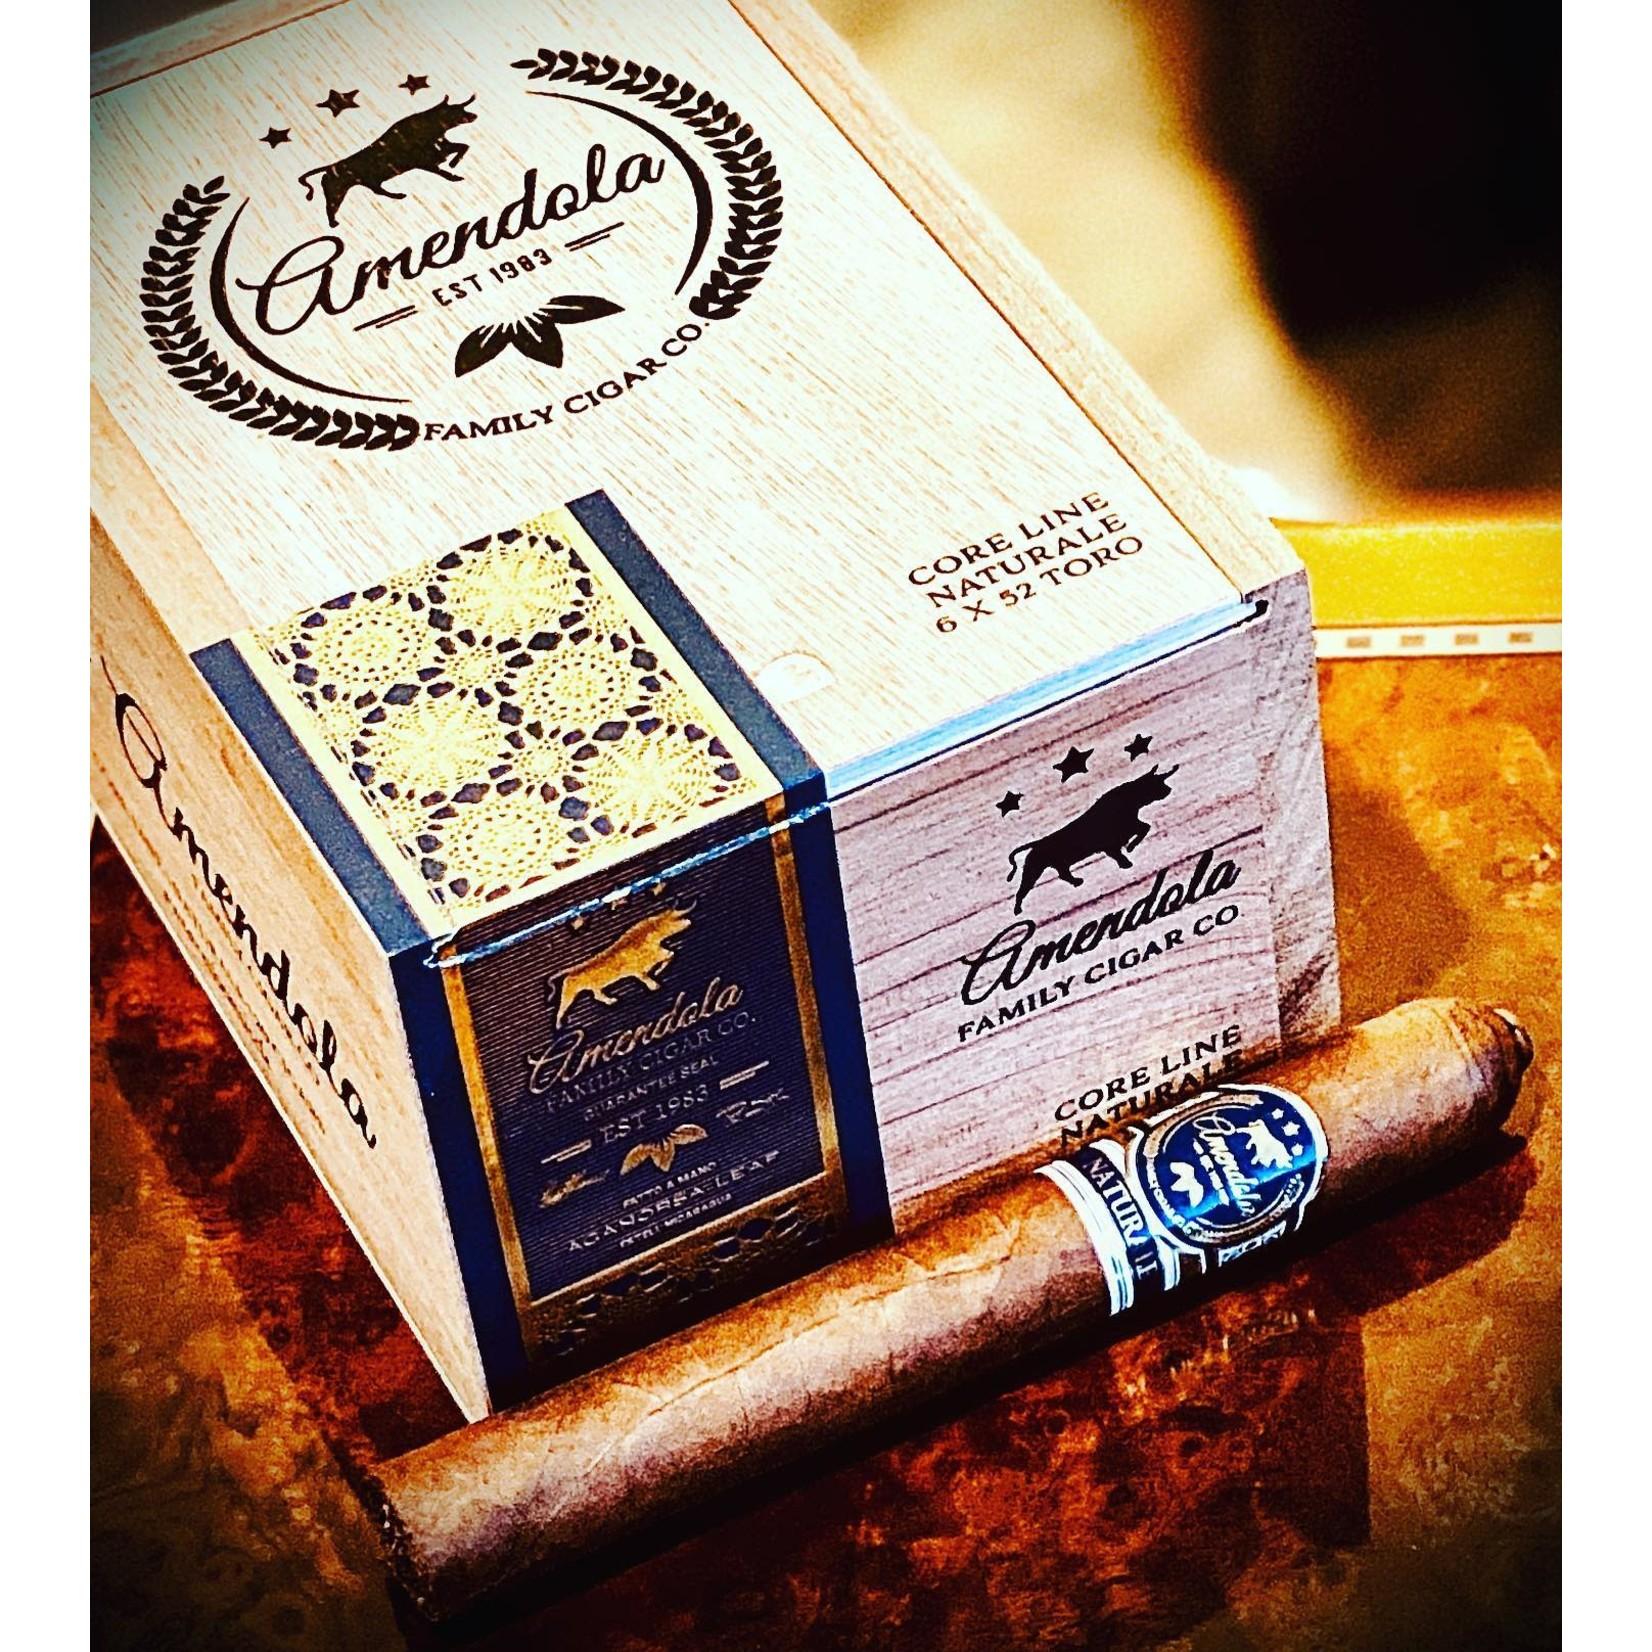 Amendola Family Cigars Naturale